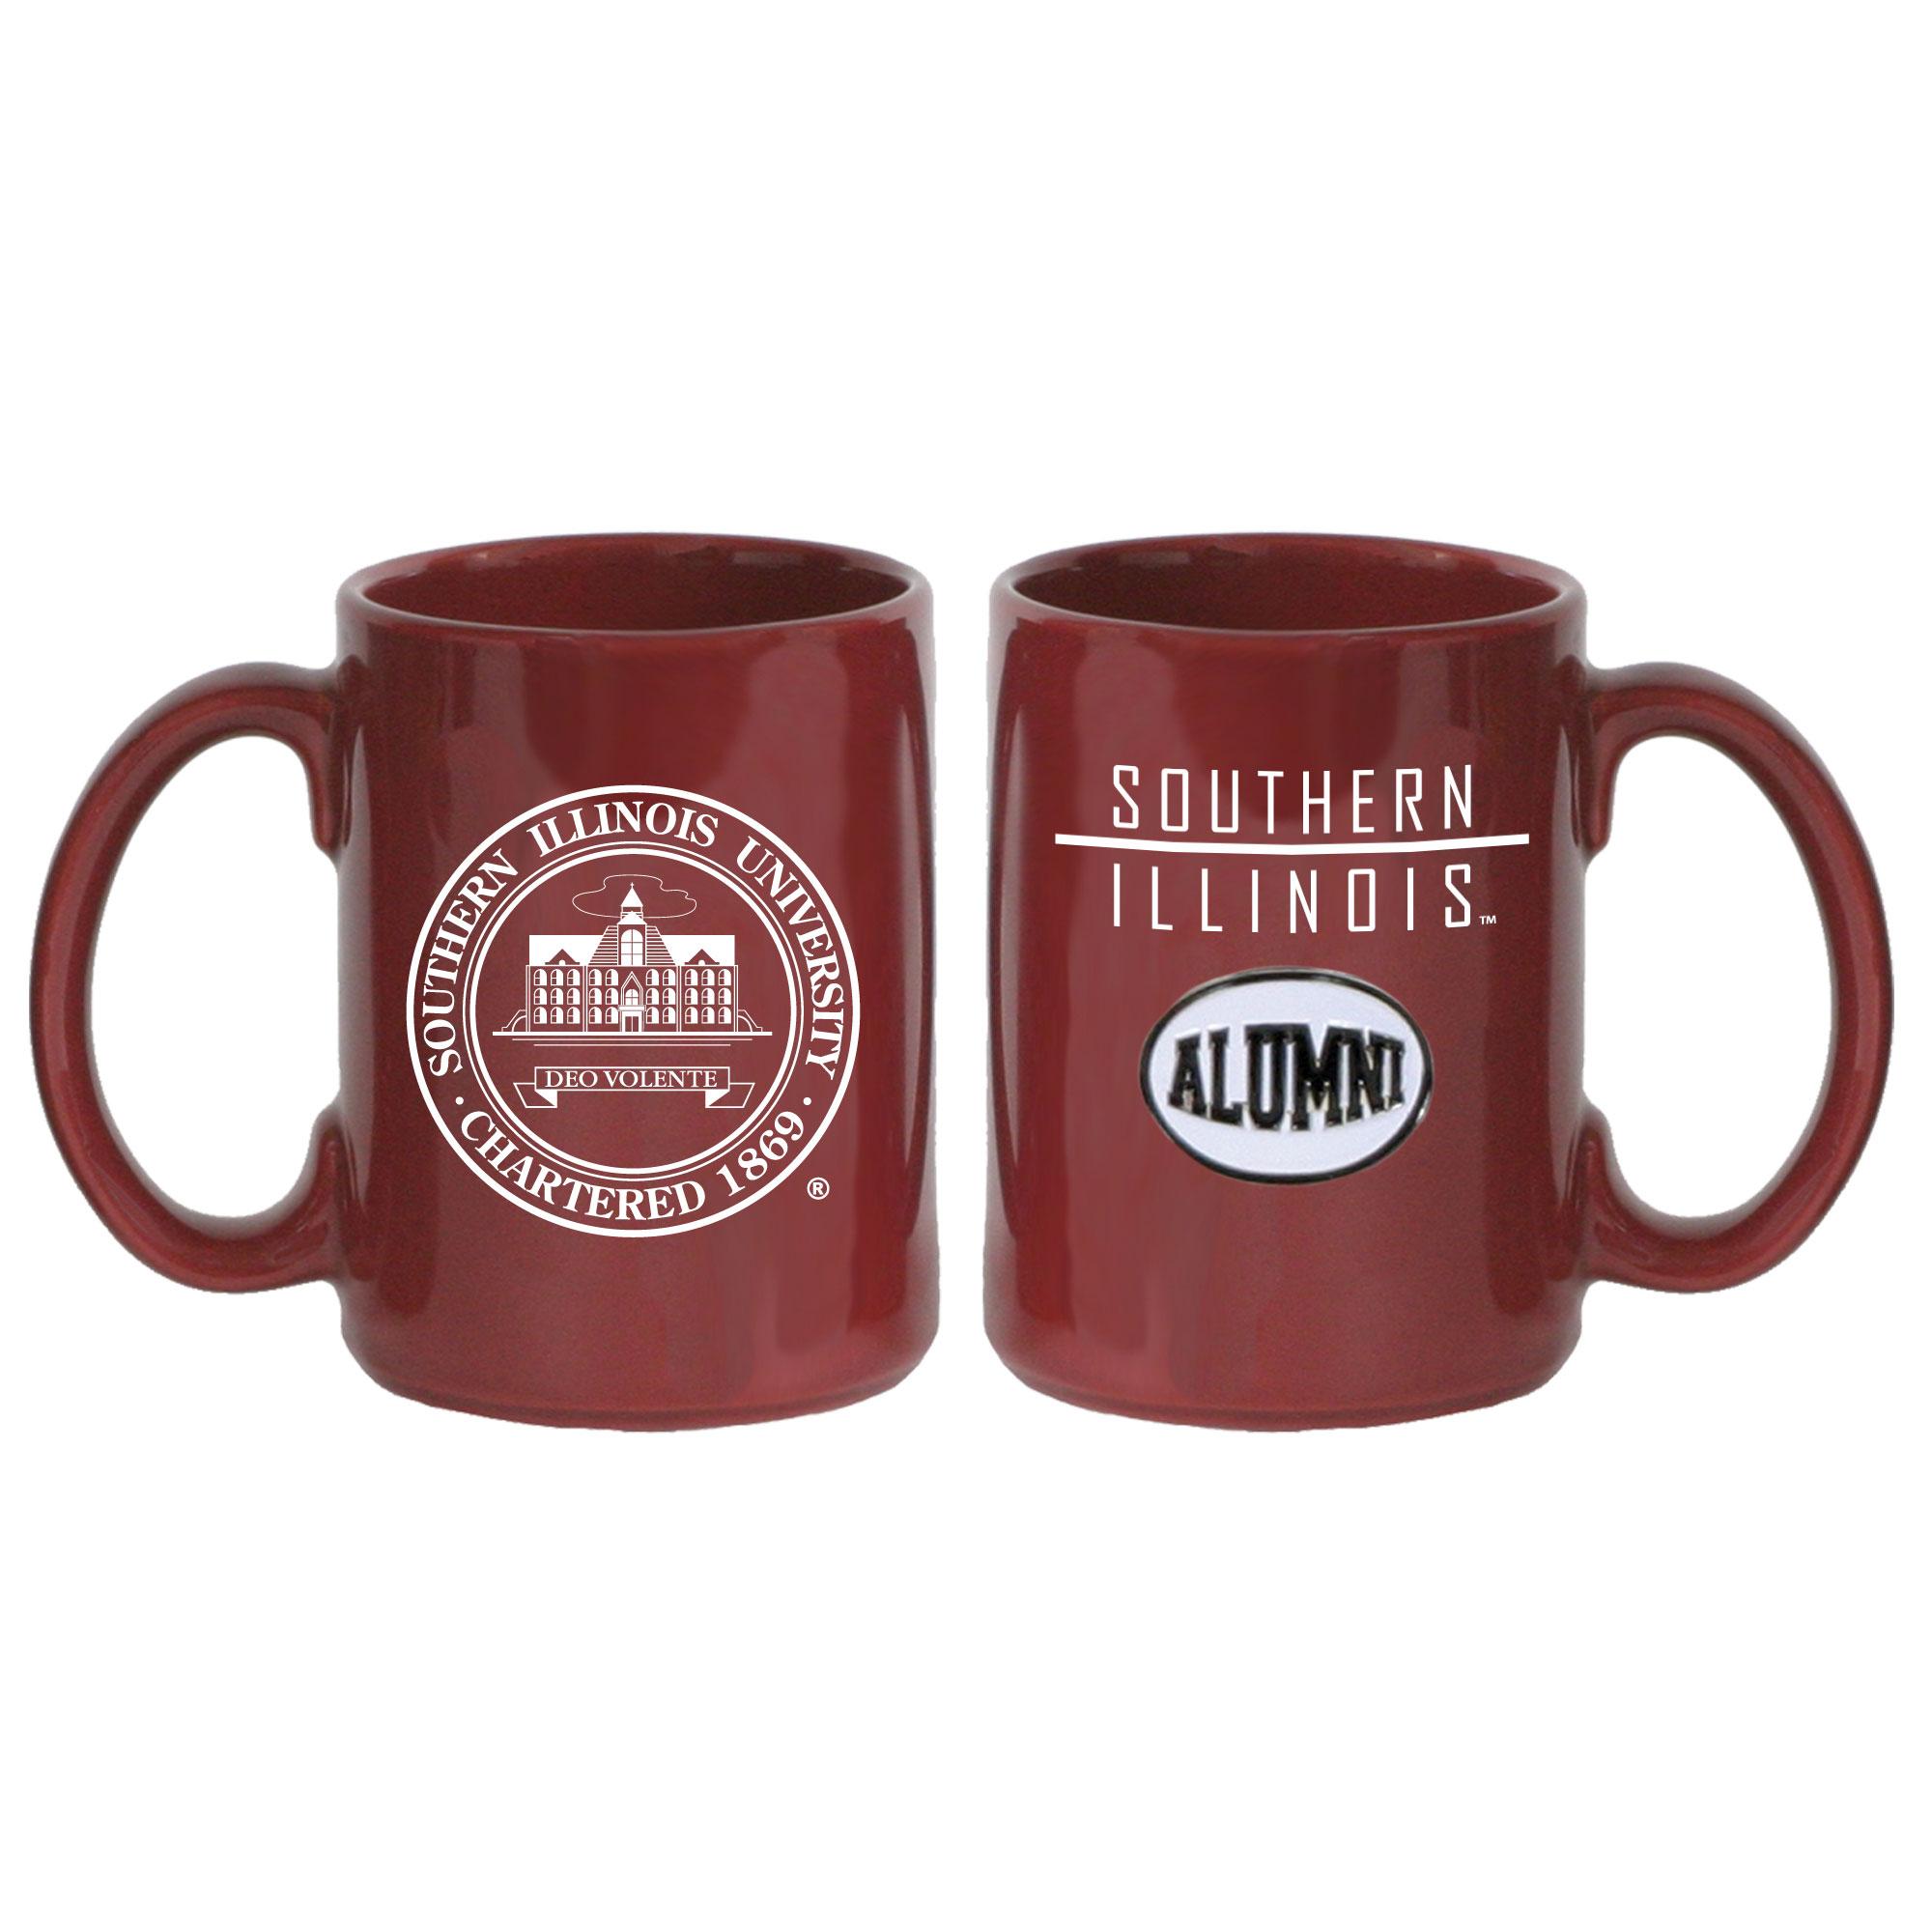 Image for the SPIRIT® SOUTHERN ILLINOIS UNIVERSITY SEAL ALUMNI MEDALLION MAROON COFFEE MUG product